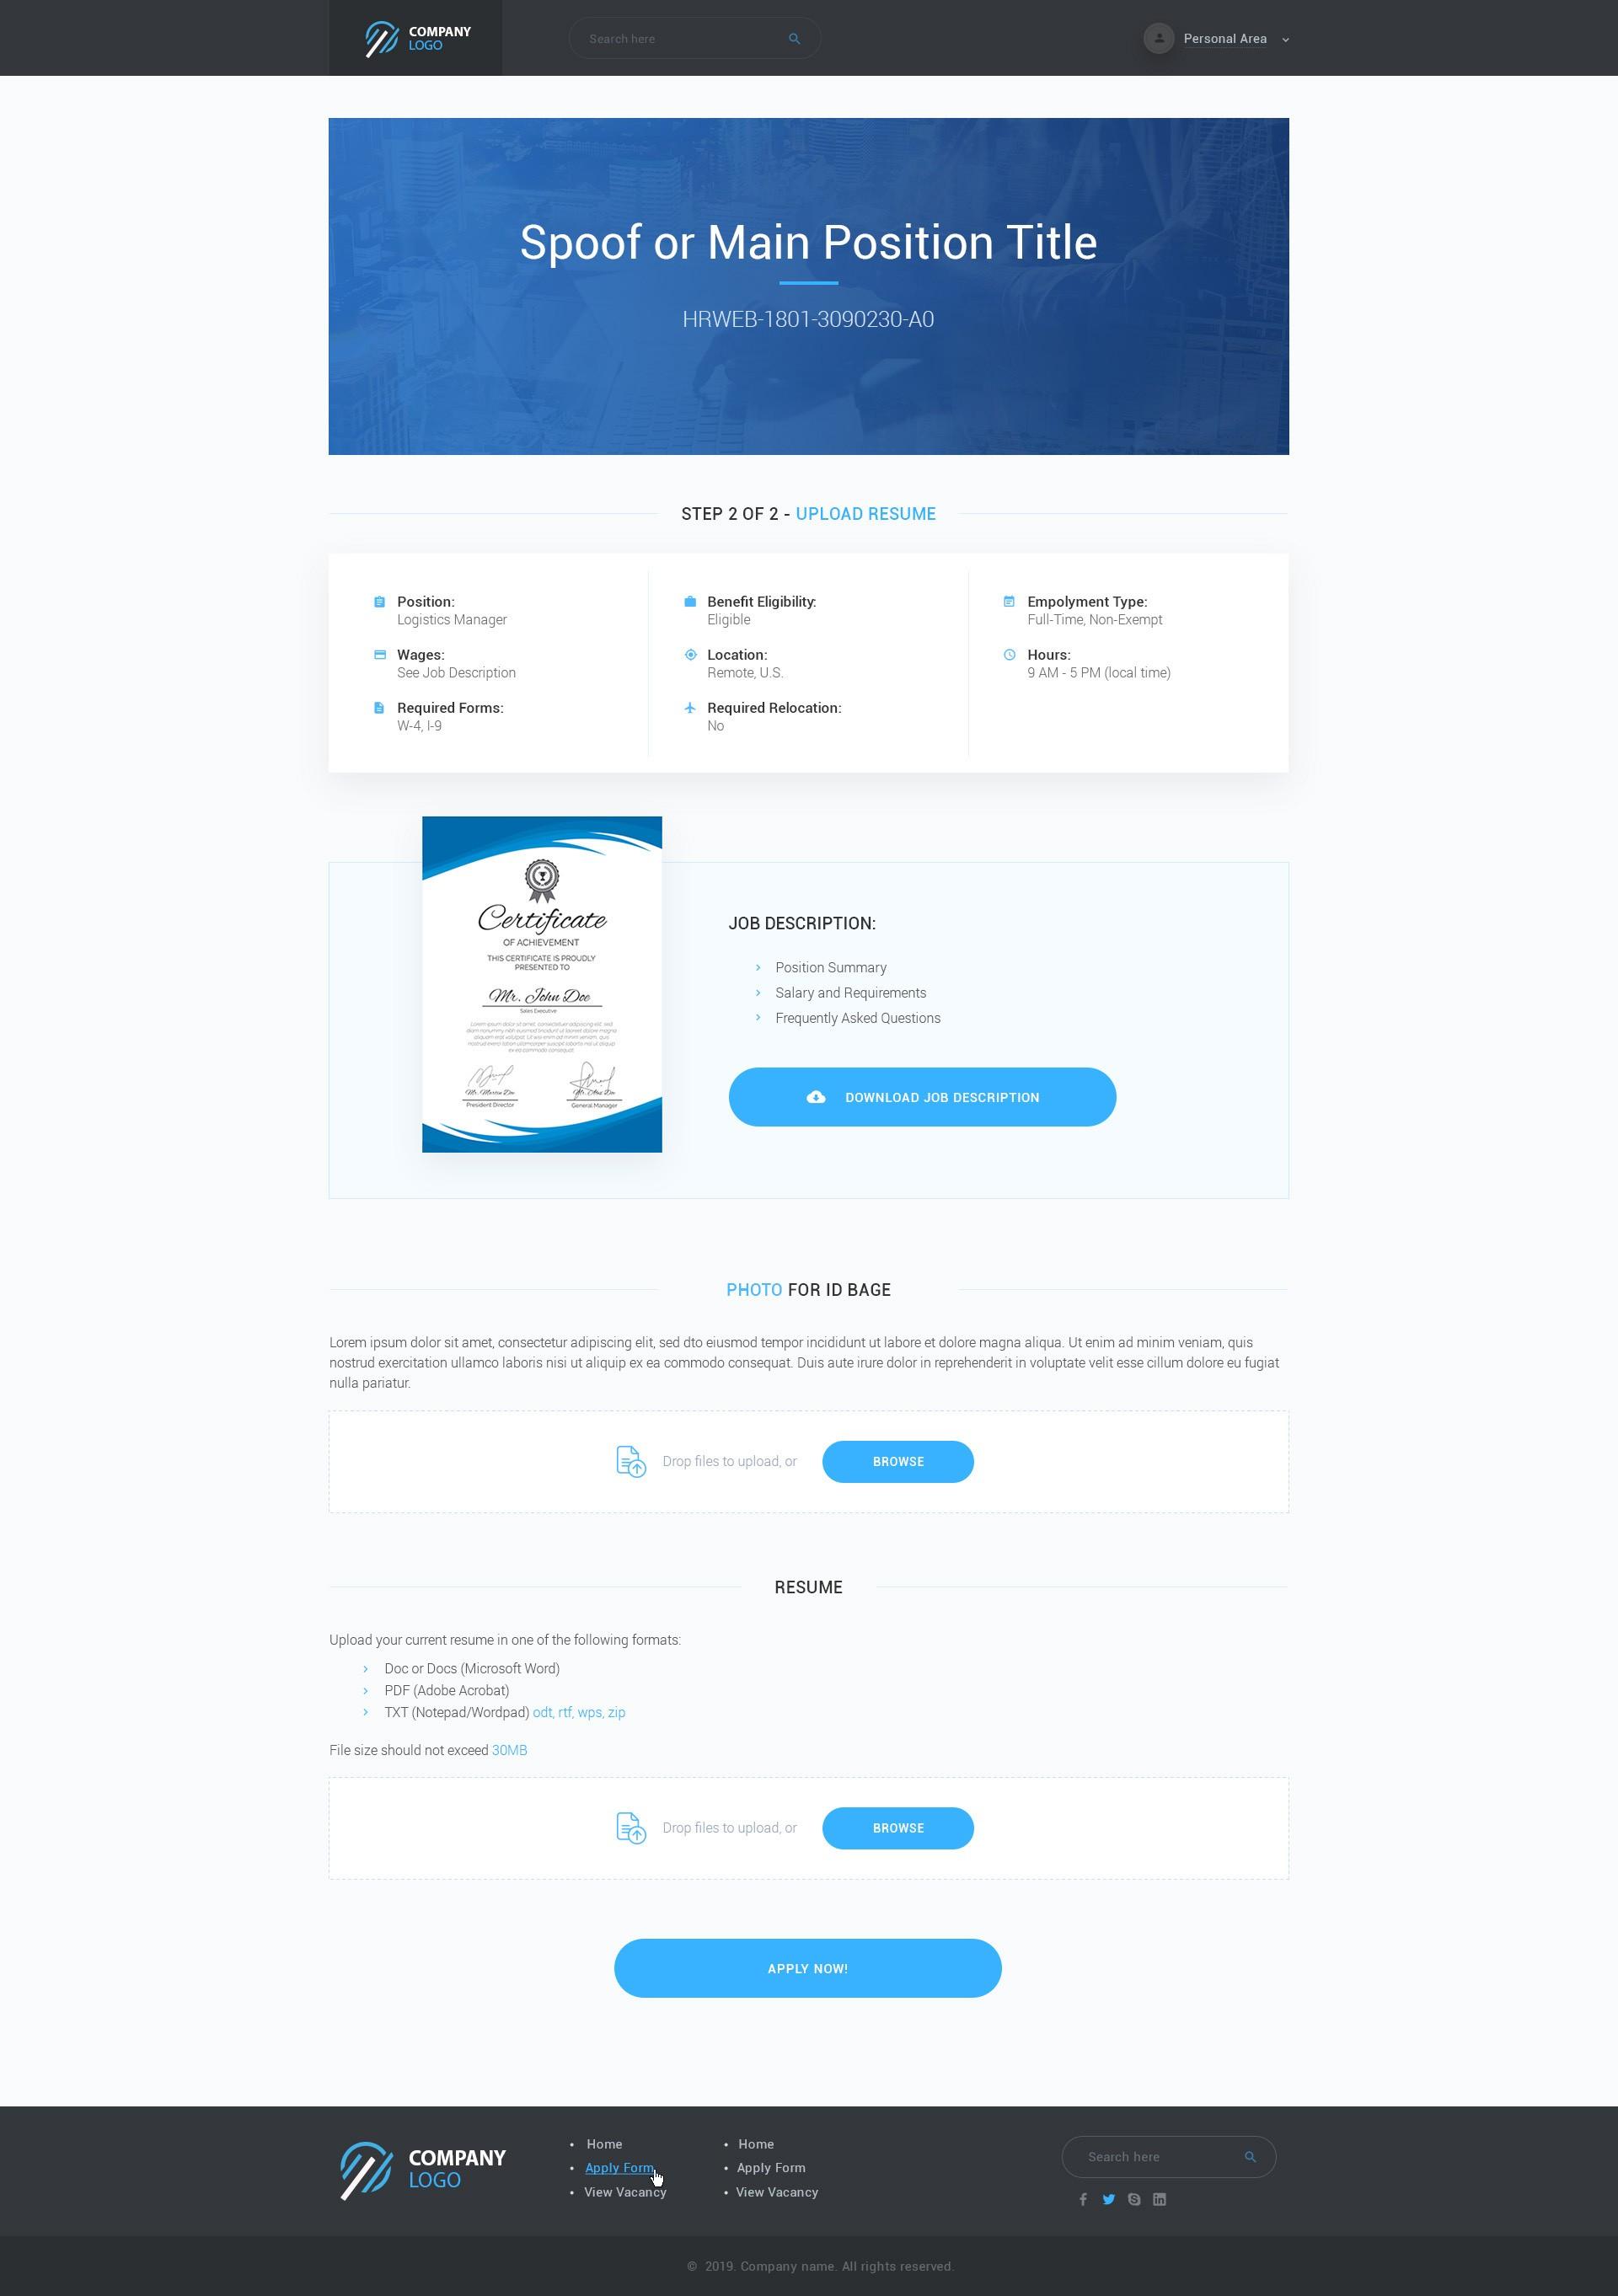 Jobs-Dashboard_12_Apply-form_Step-2_0.1